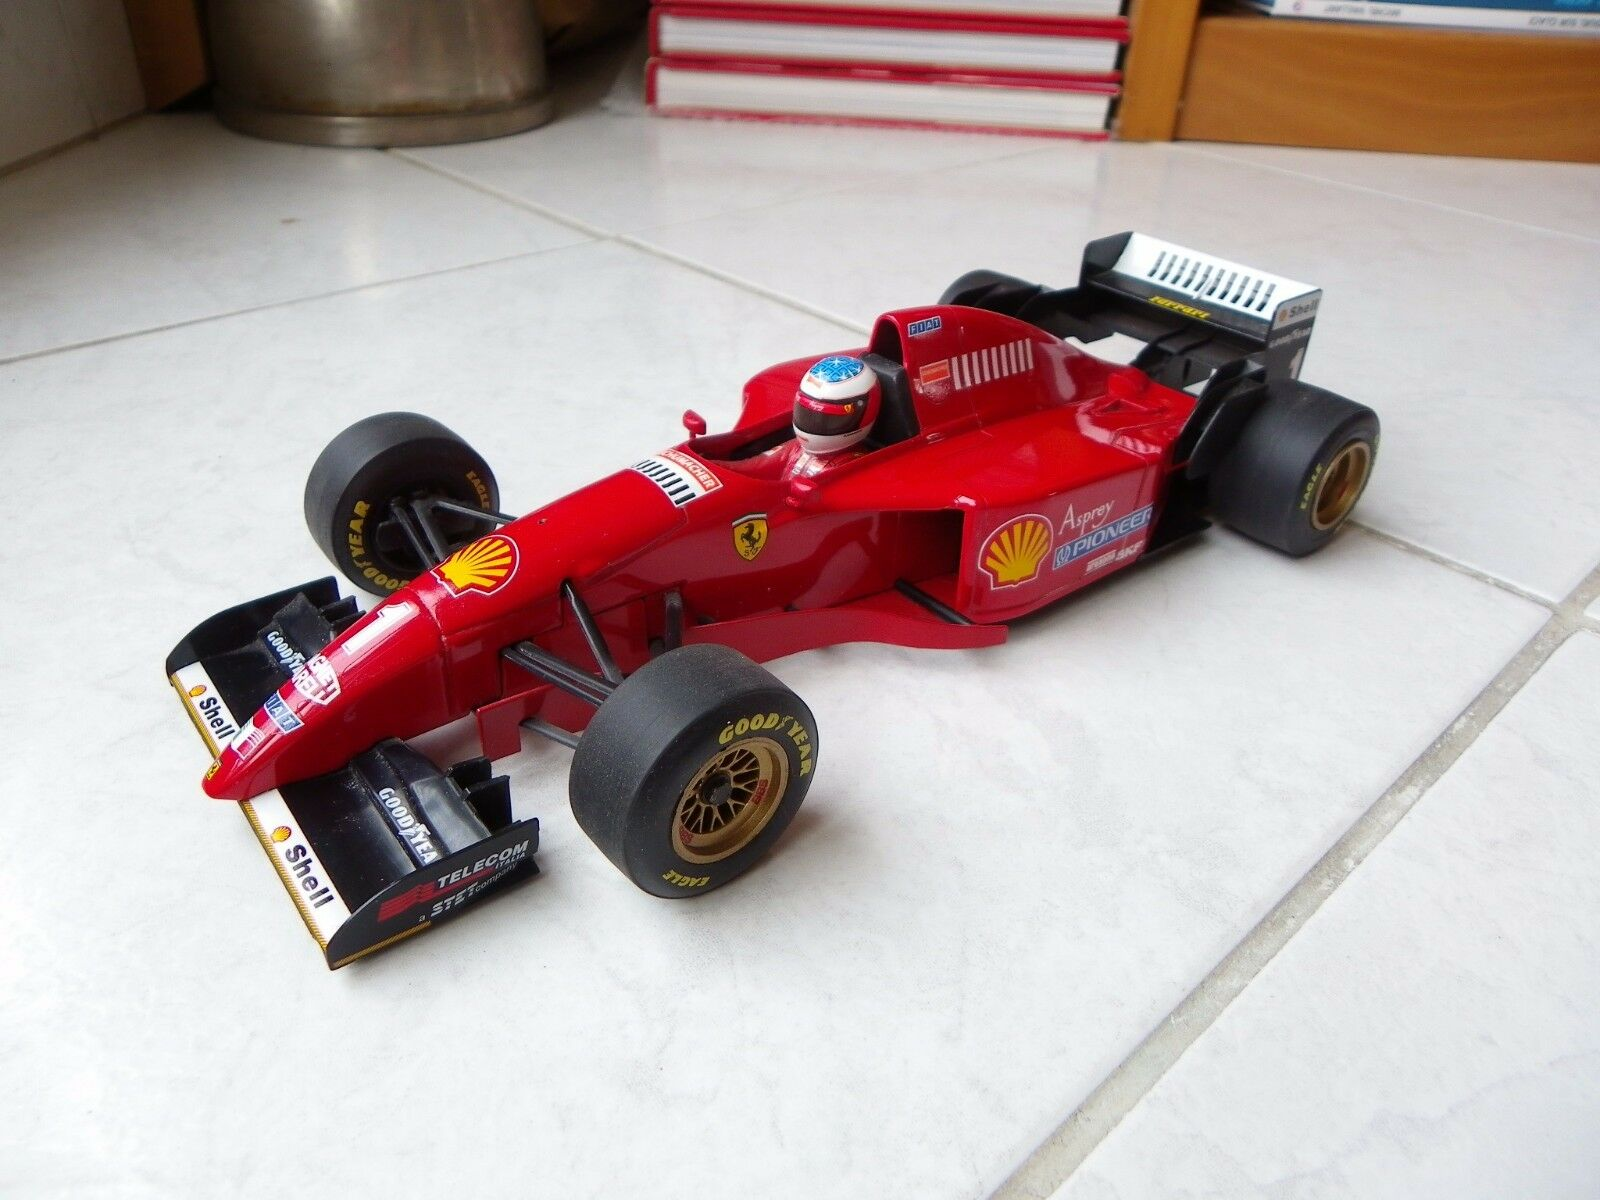 Ferrari 412 T2 Michael Schumacher  1 1996 1 18 Minichamps Racing F1 avec moteur